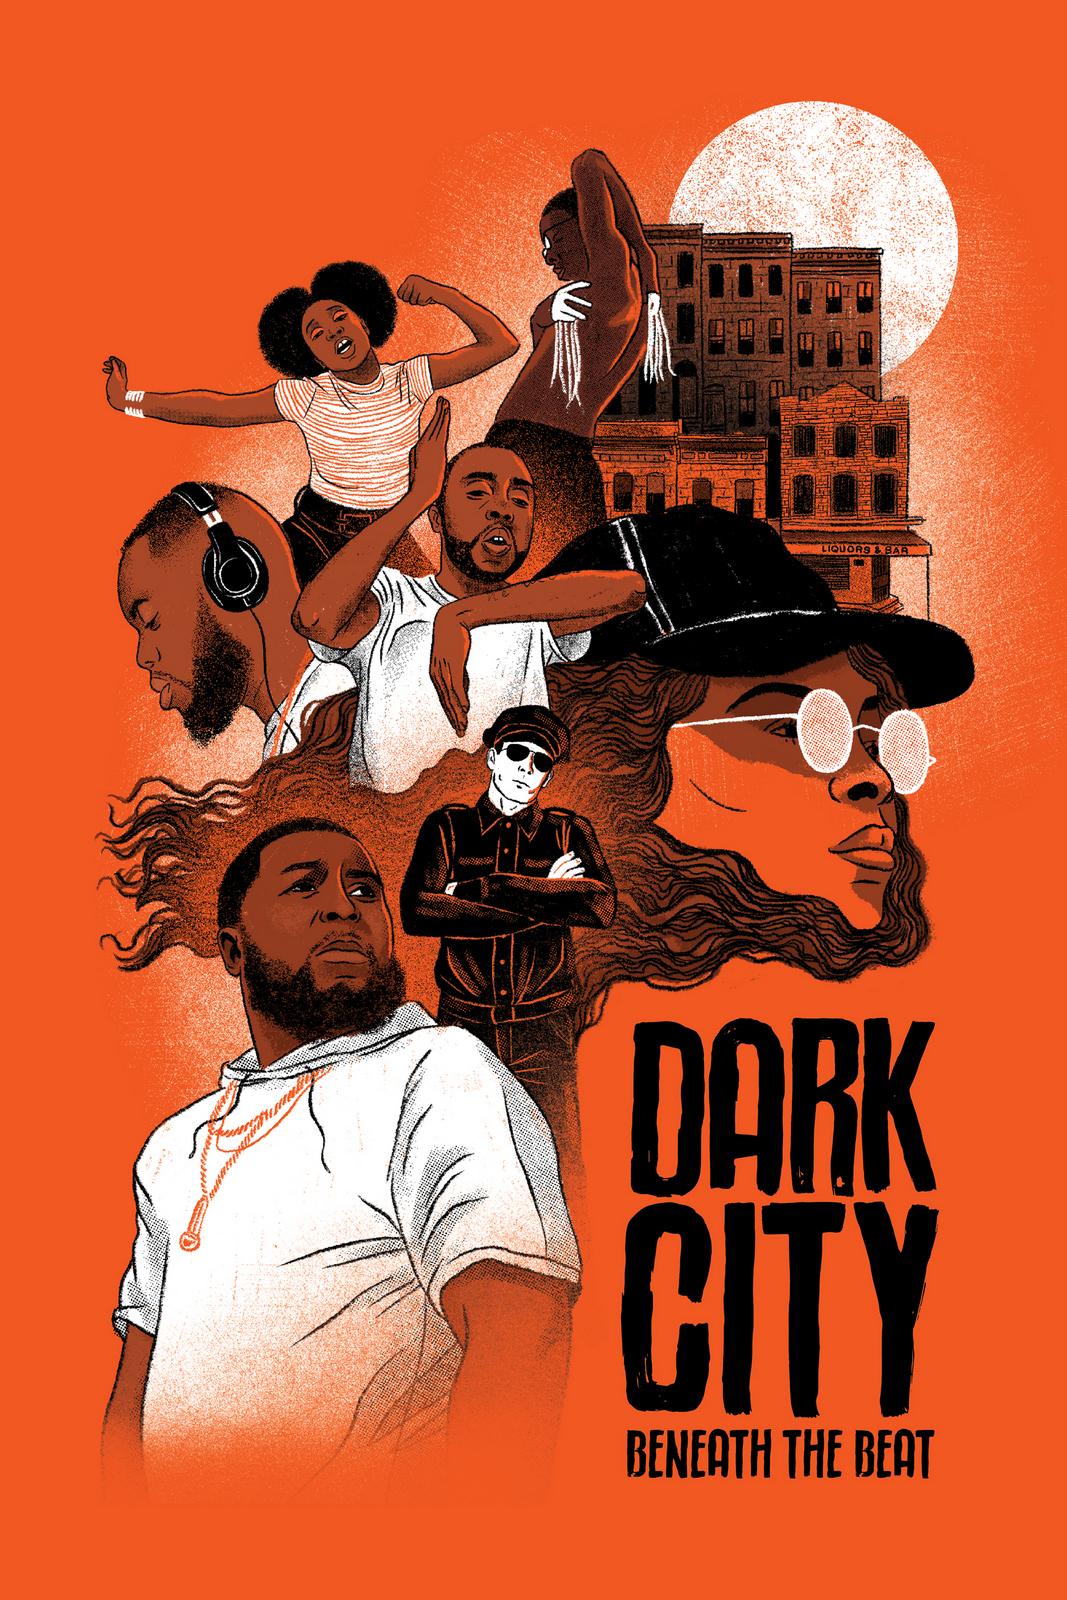 Dark City Beneath the Beat.jpg